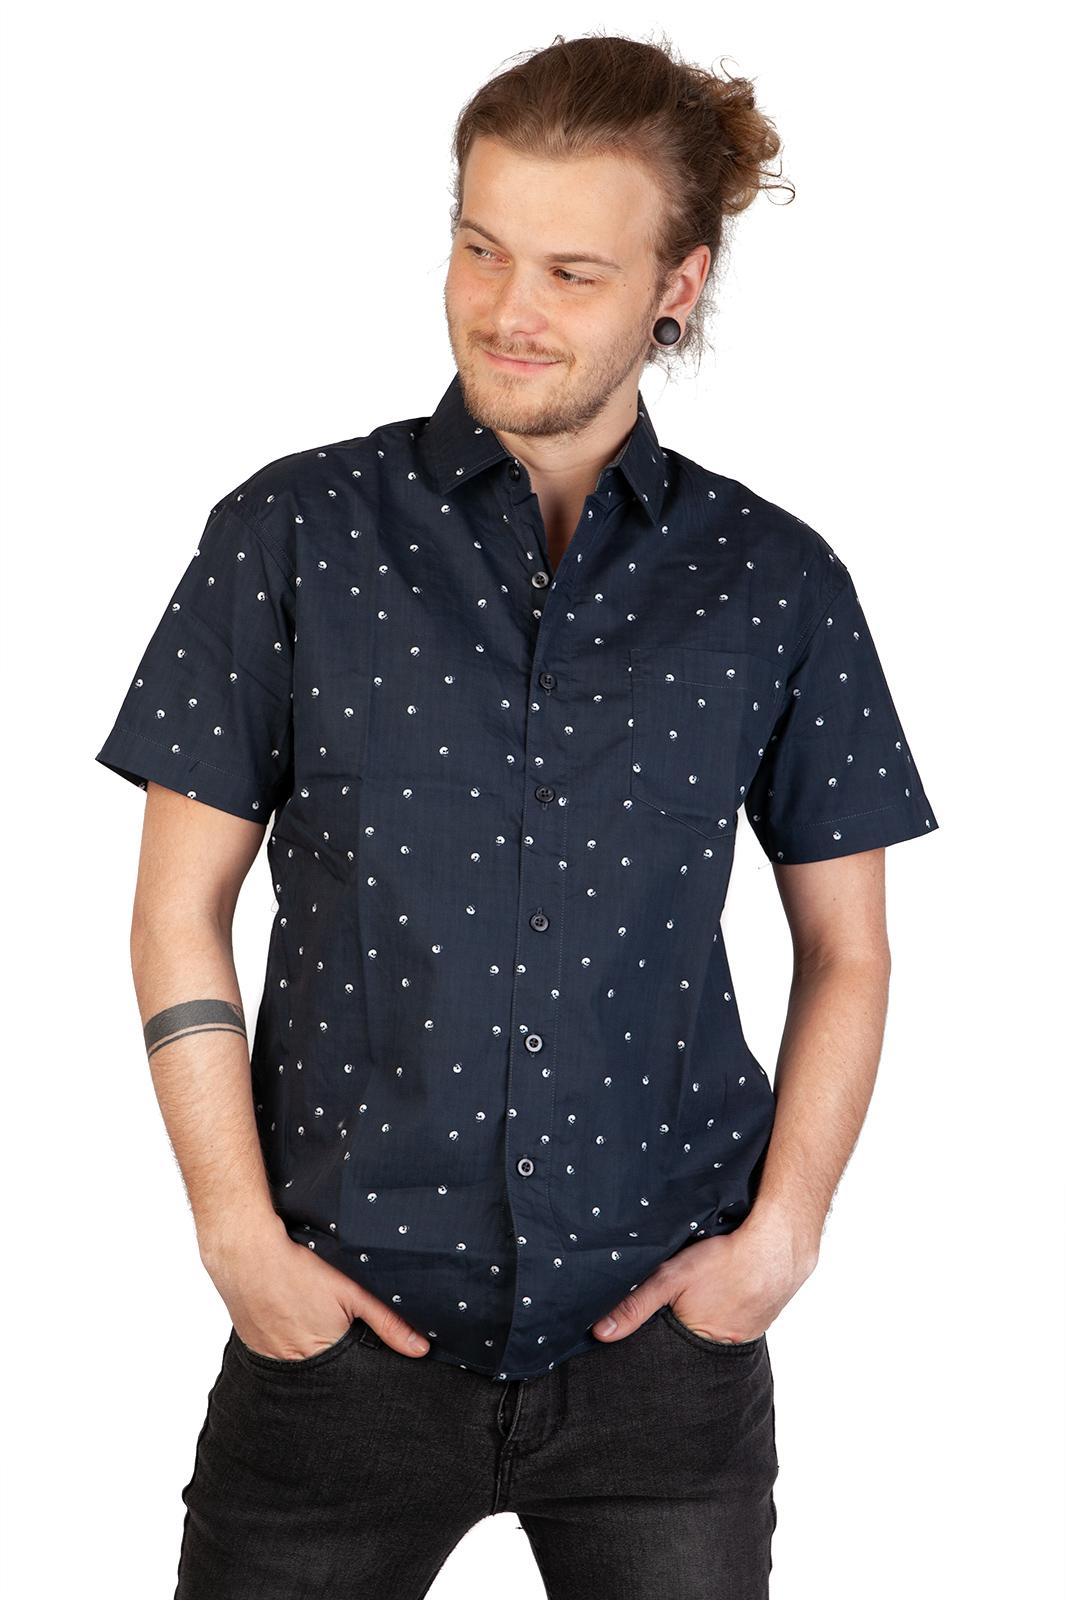 Polka Skull Shirt Black